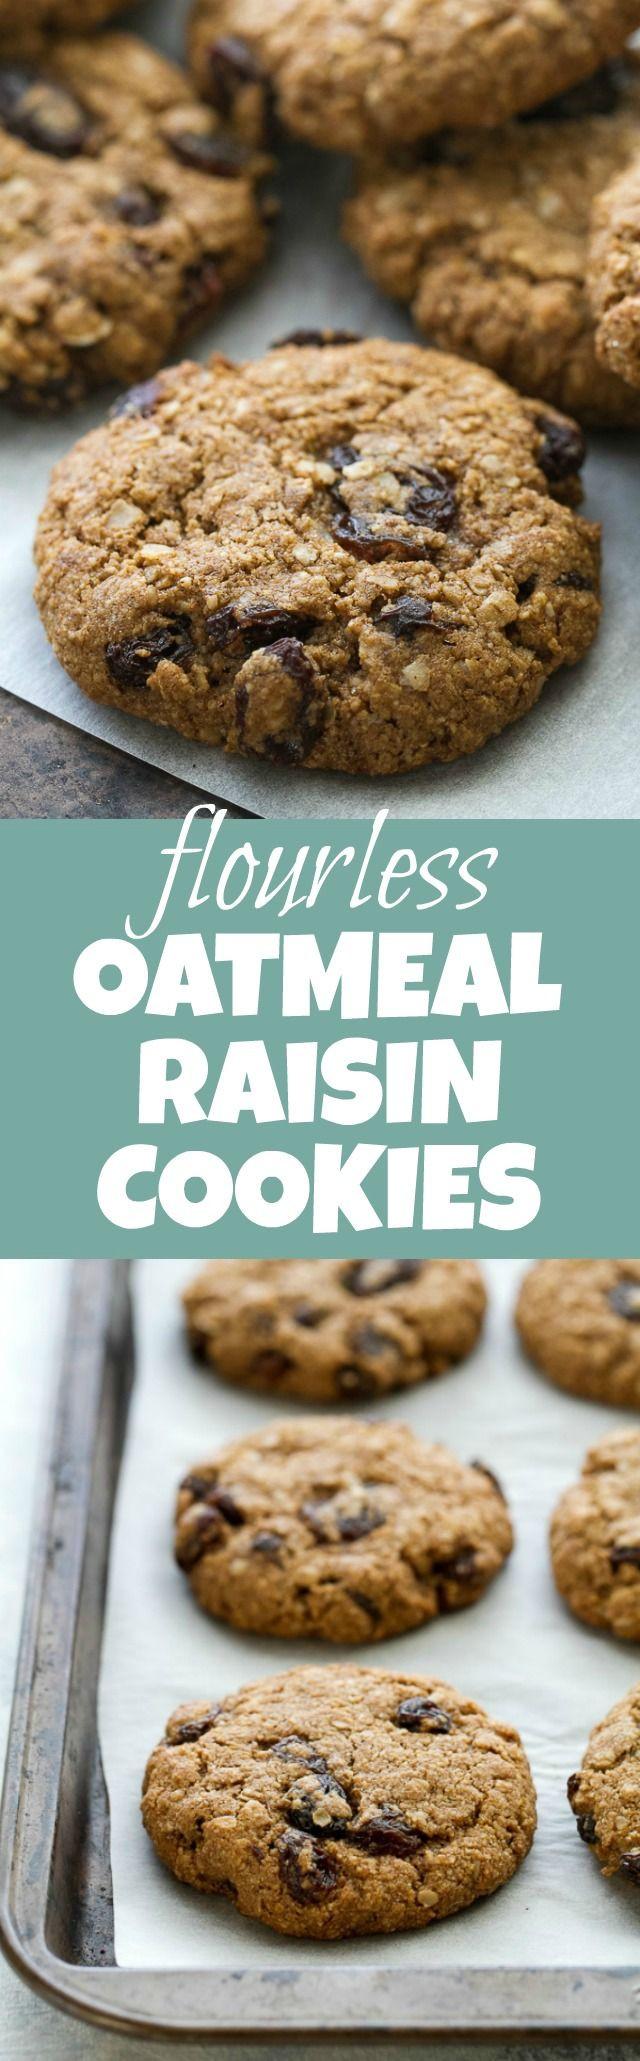 Oatmeal Cookies Recipe Healthy  heart healthy oatmeal raisin cookies